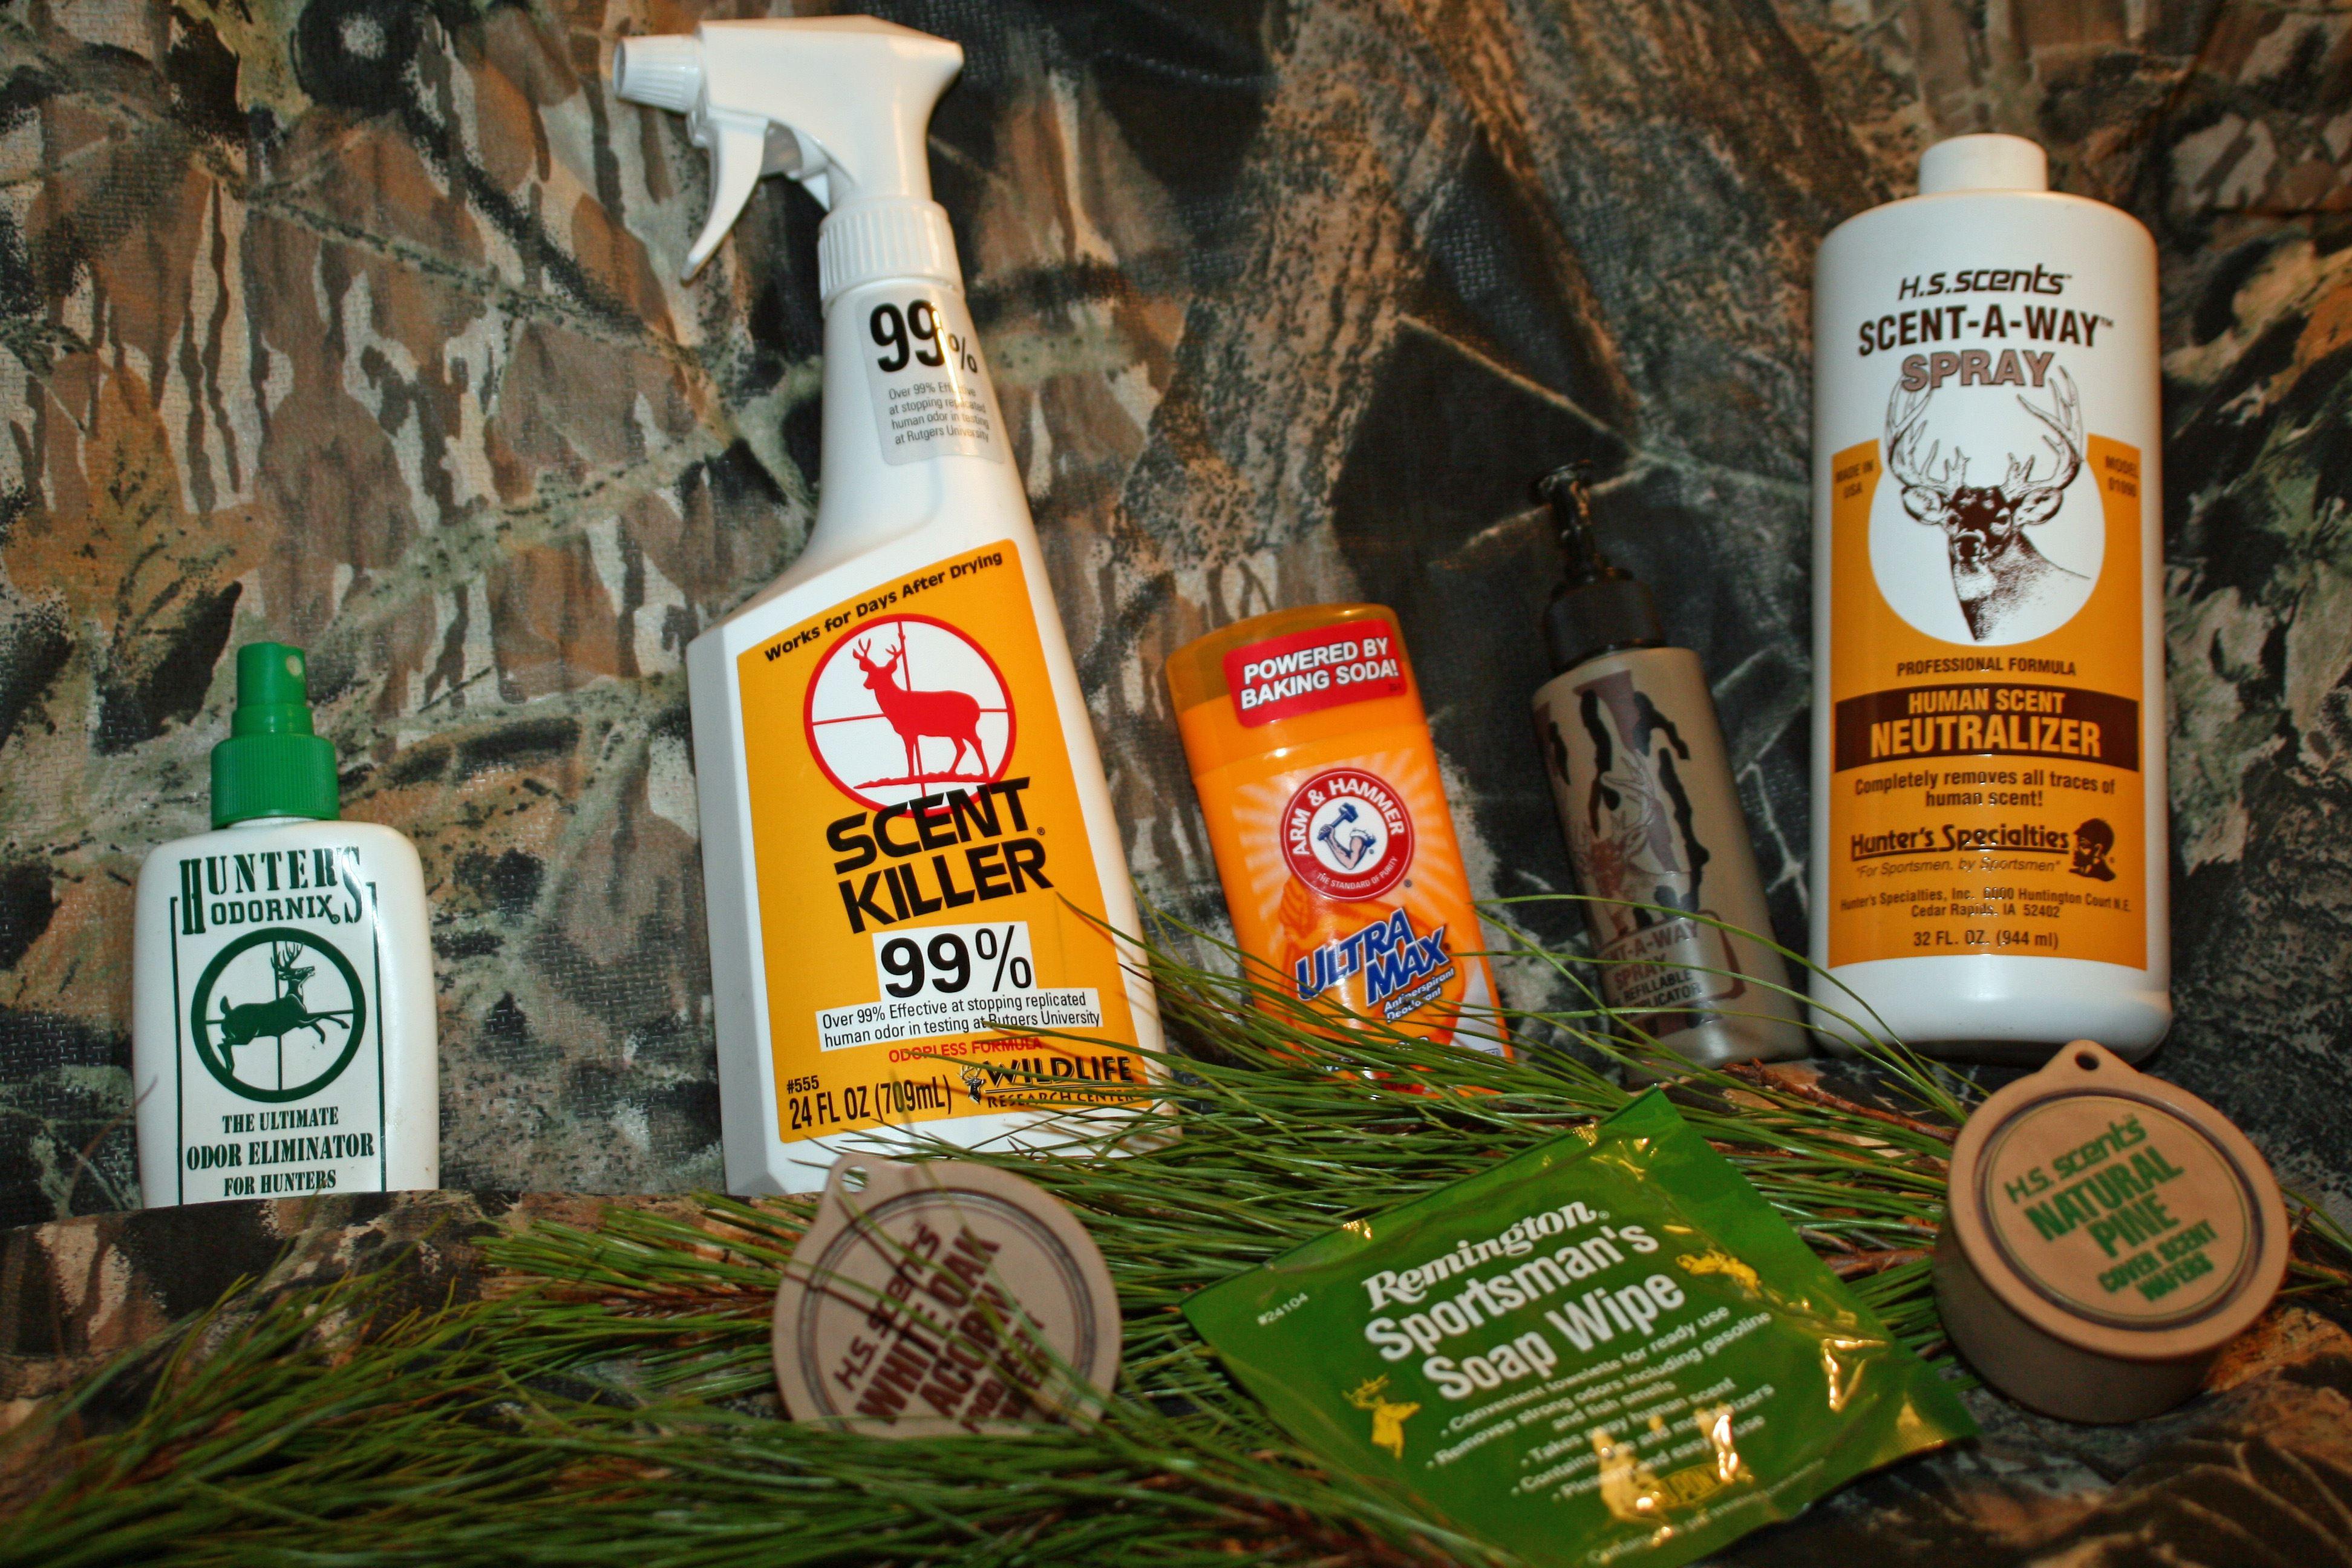 Eliminate Your Human Odor for Deer Hunting